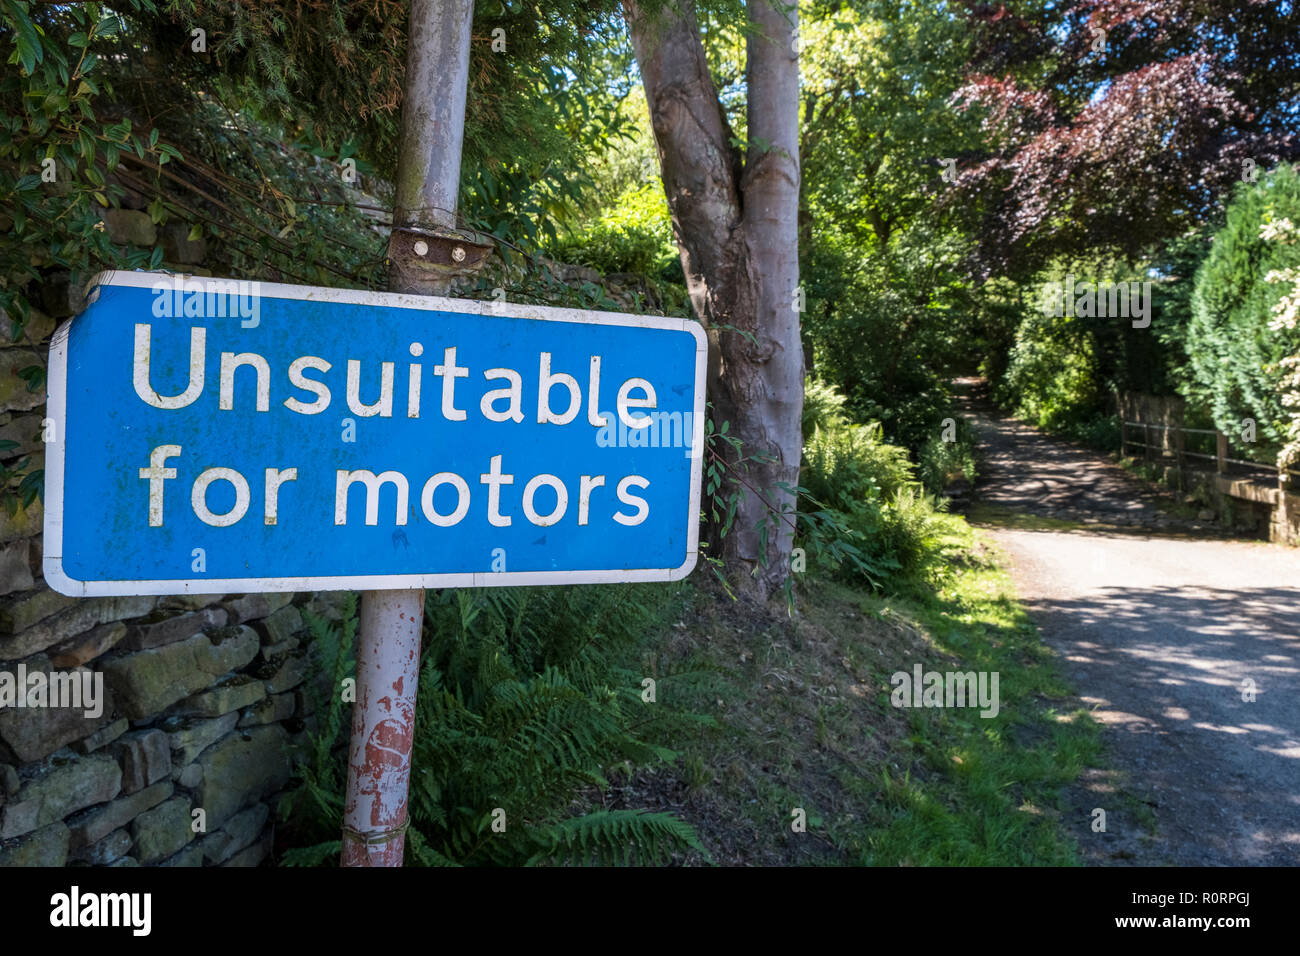 Unsuitable for motors road sign, Derbyshire, England, UK - Stock Image